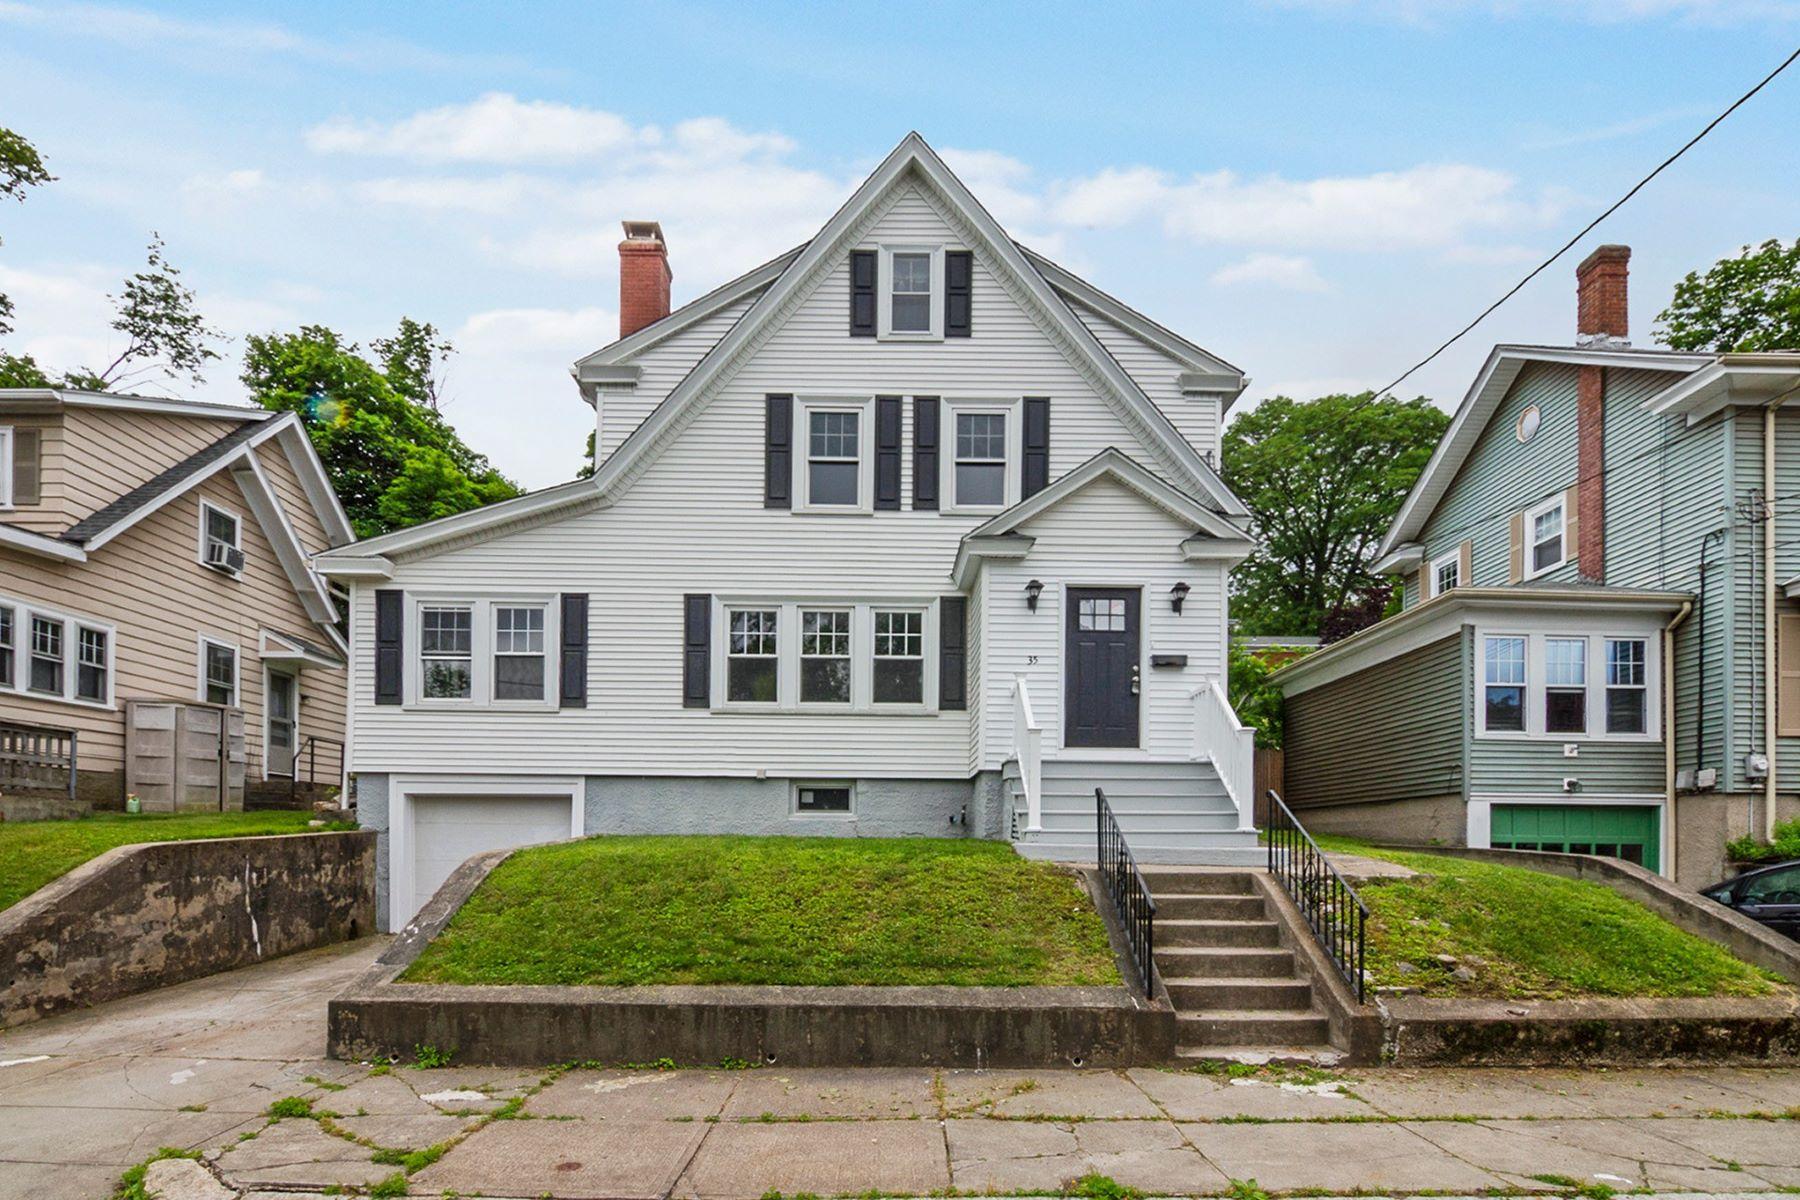 Single Family Homes للـ Sale في Bright remodeled home in great location 35 Sheffield Av., Pawtucket, Rhode Island 02860 United States